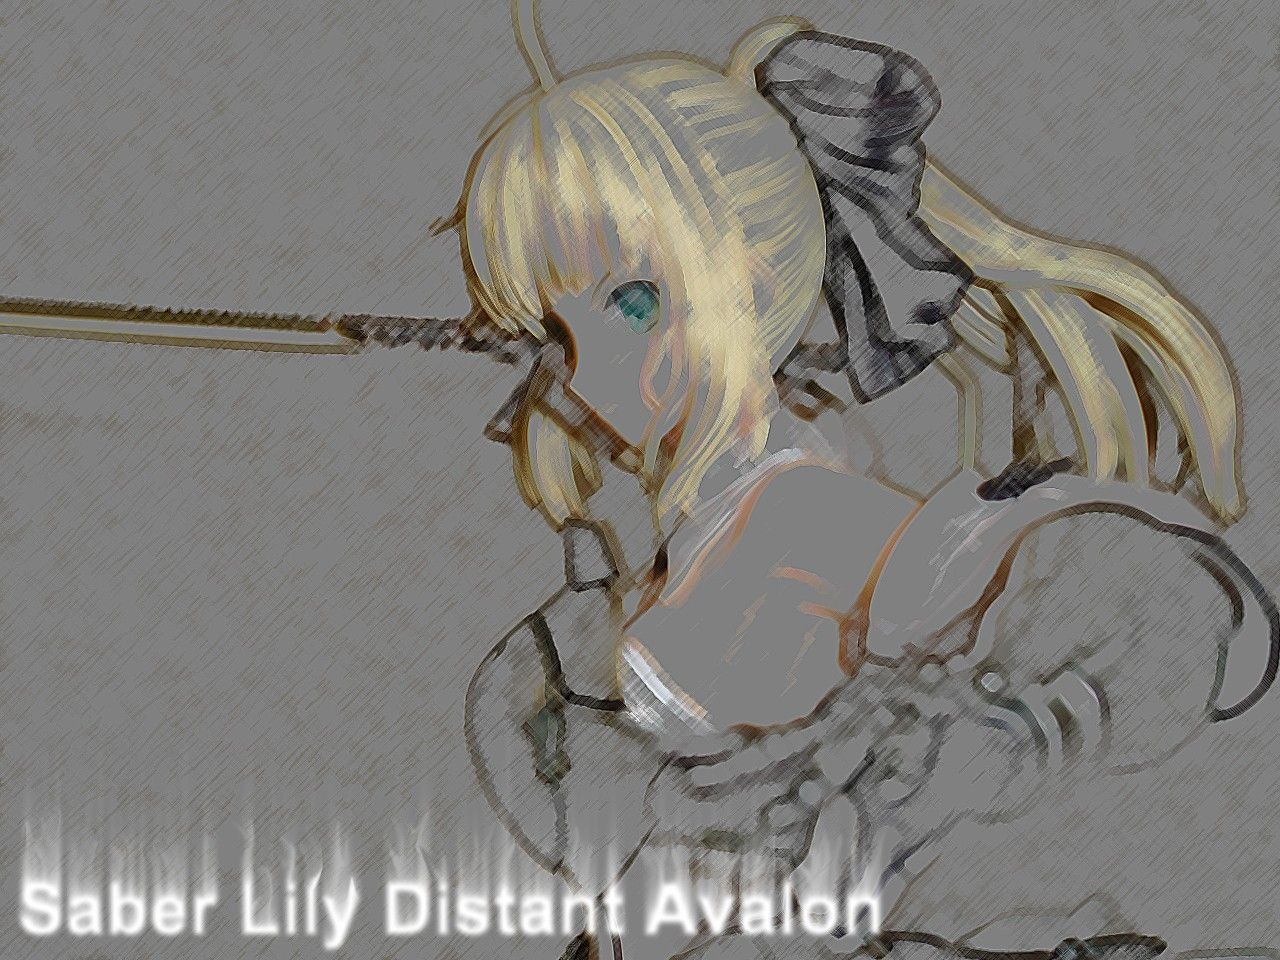 Minitokyo_Fate_Hollow_Ataraxia_Wallpapers_413877.jpg